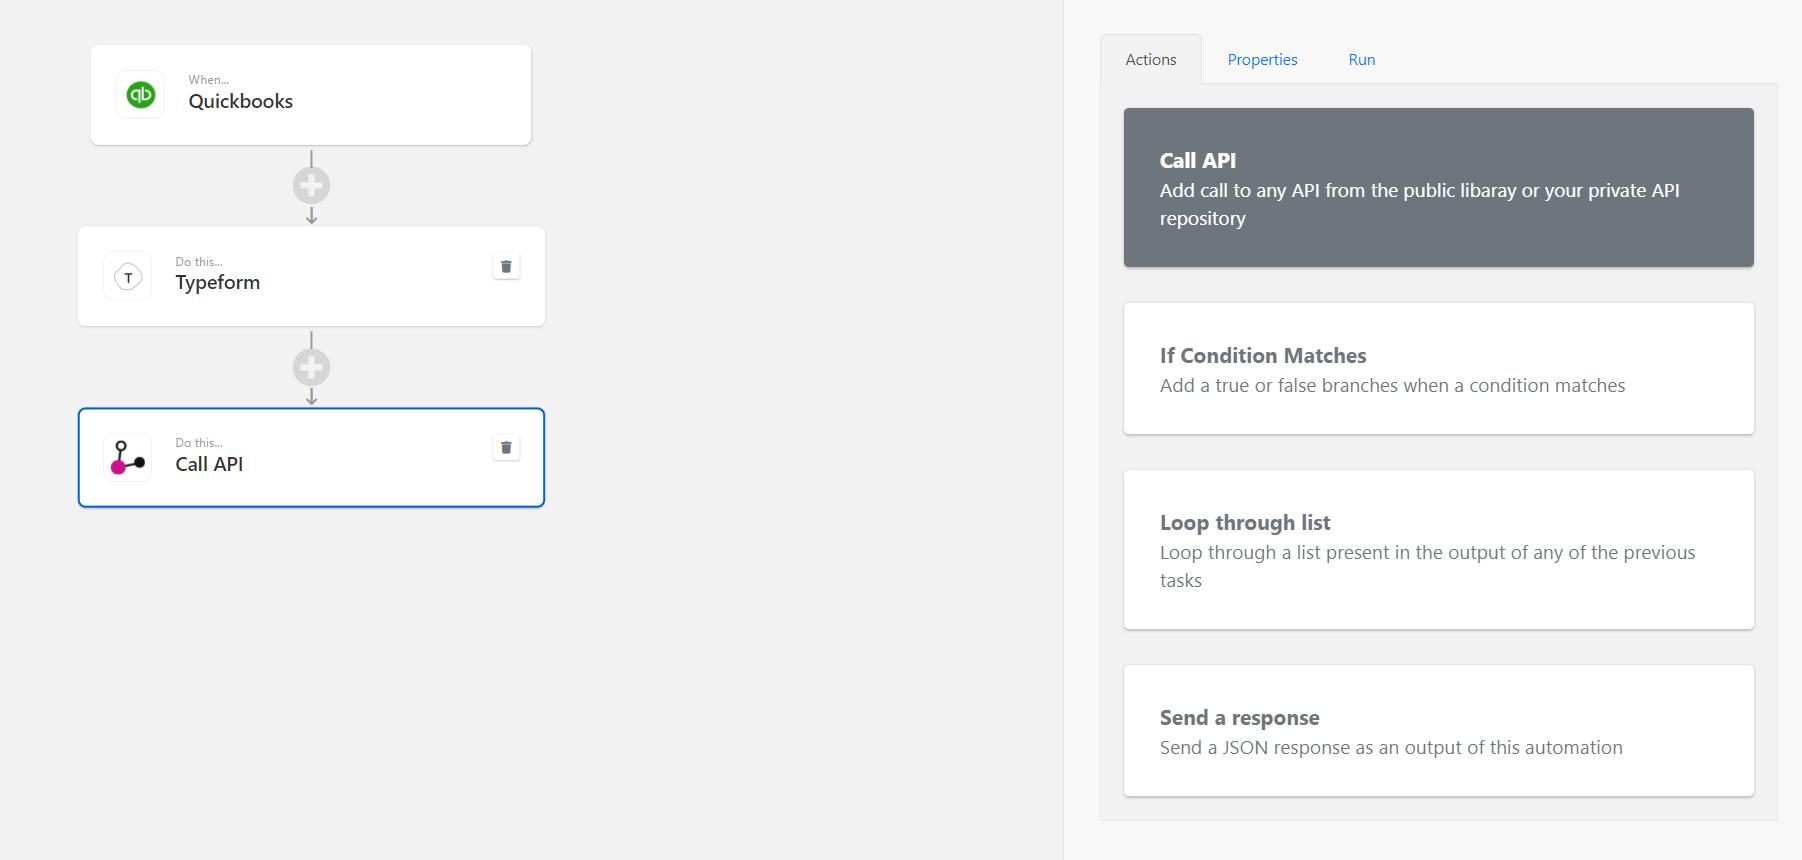 Image: Call API